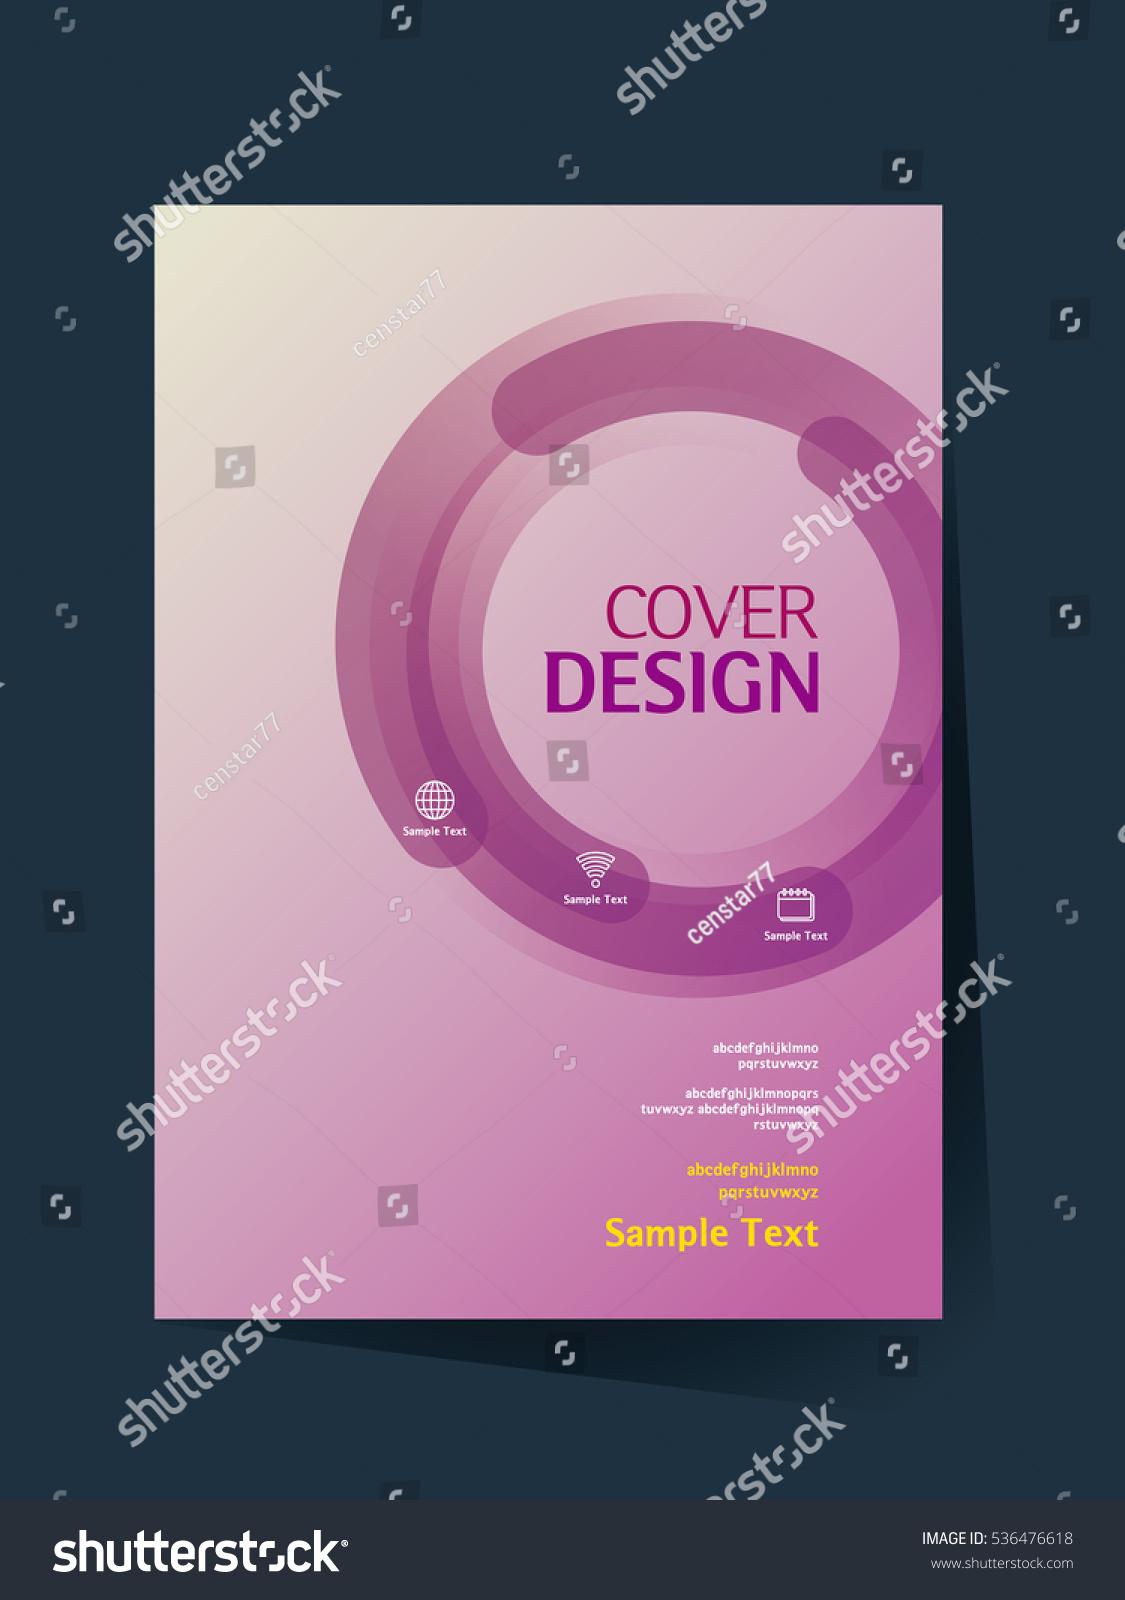 Simple Book Cover Design Templates : Brochure design vector template a size stock